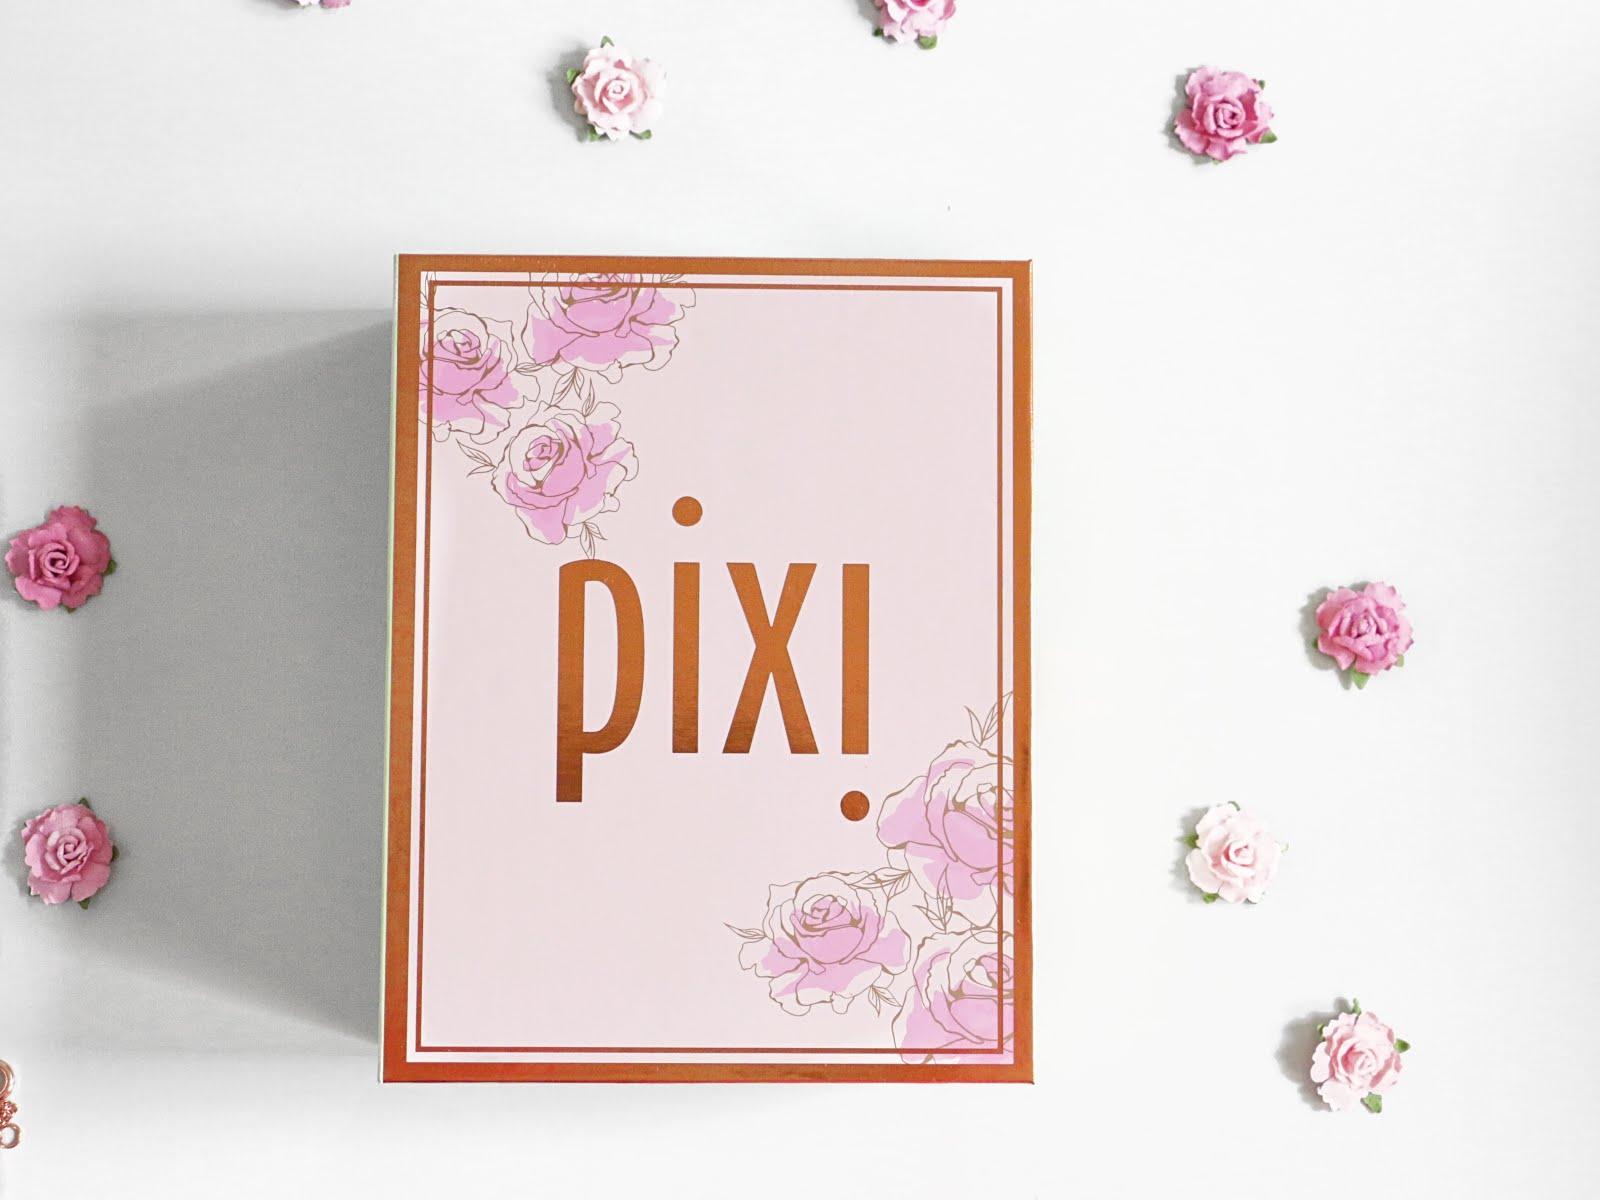 Pixi-Beauty-My-Rose-Essence-Collection-Vivi-Brizuela